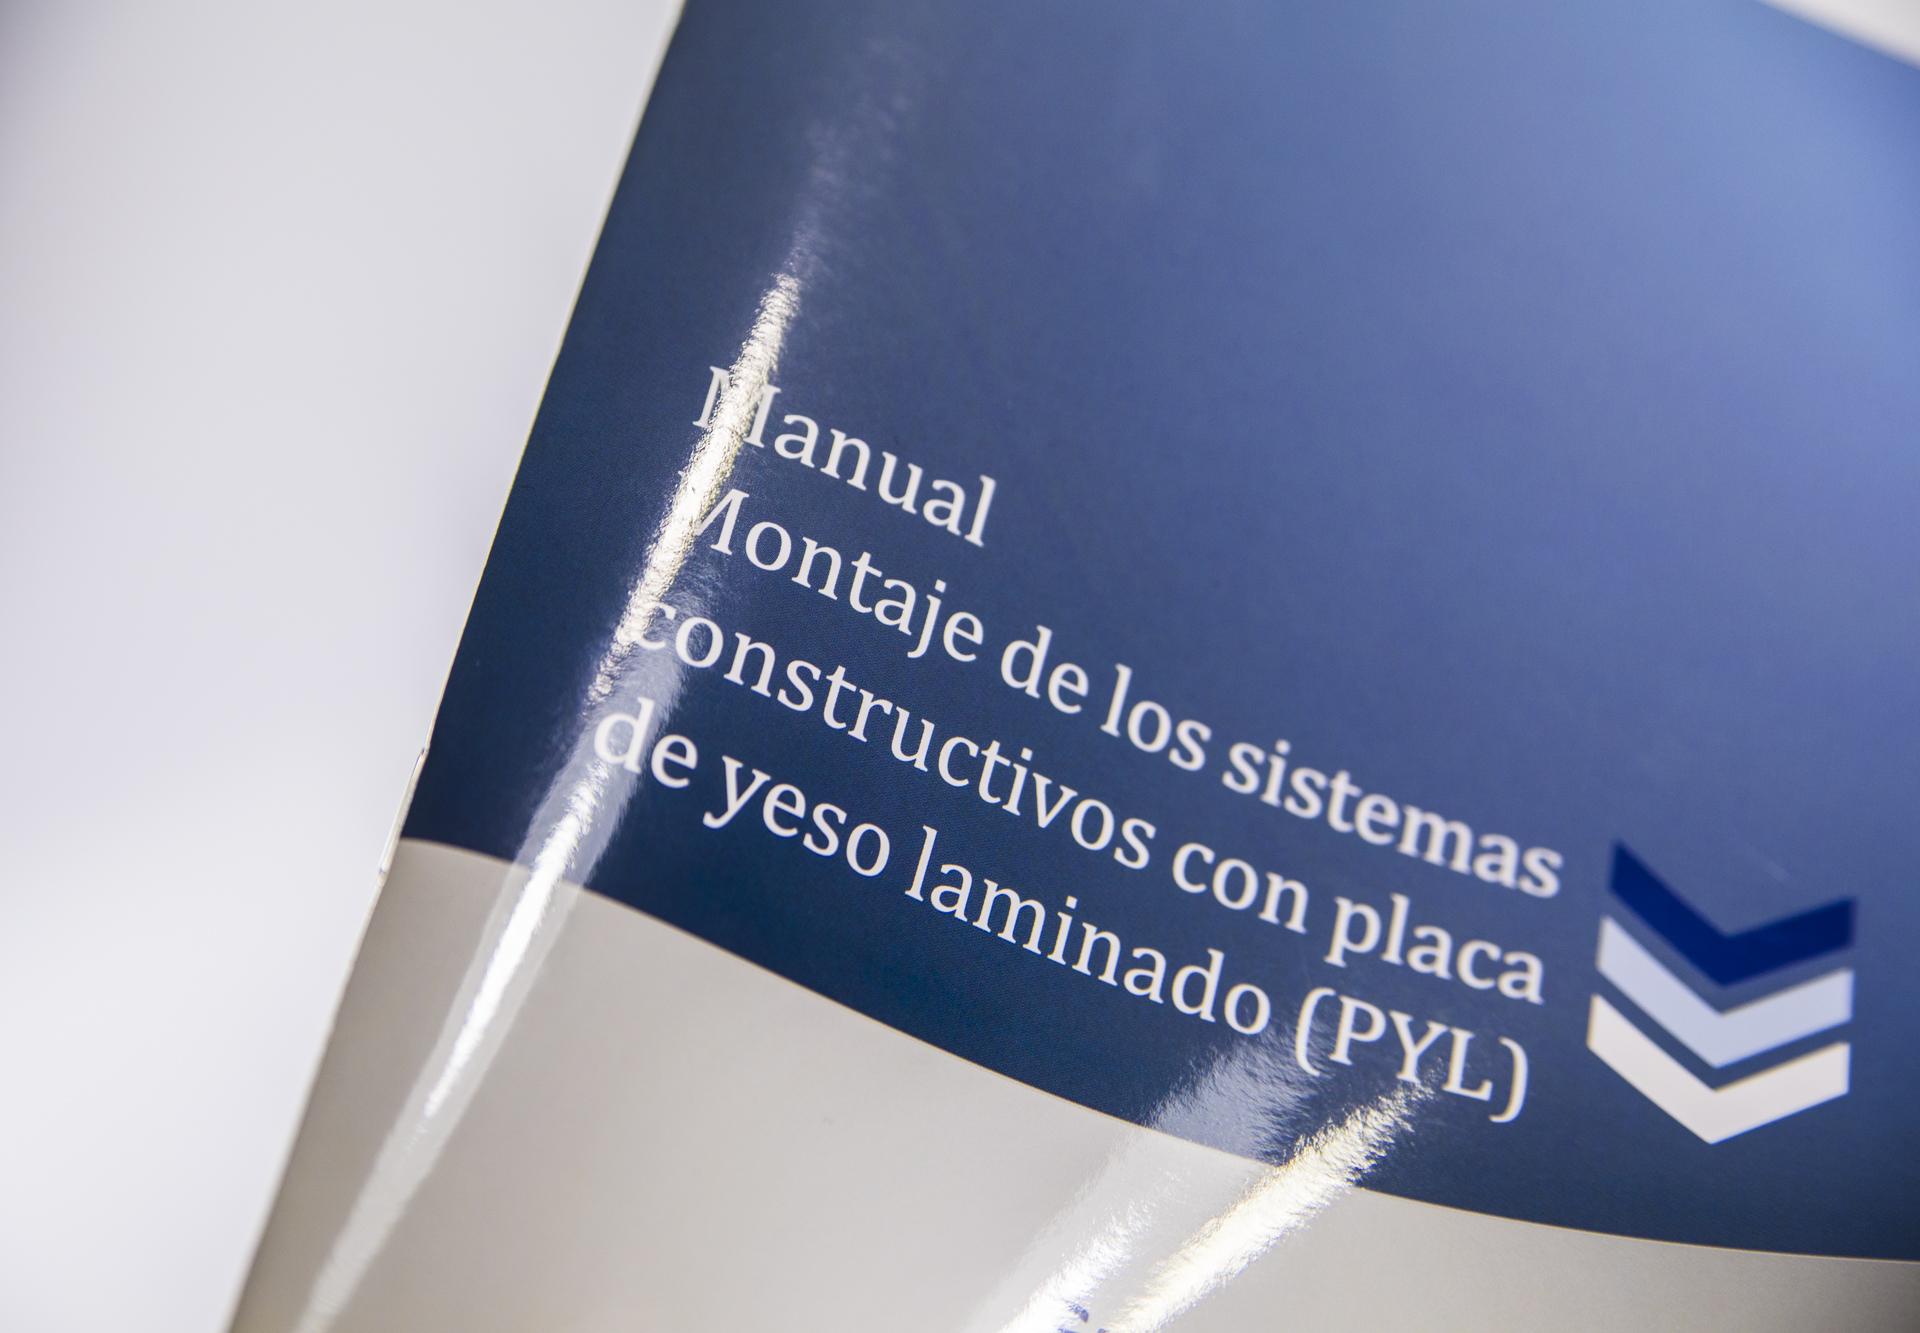 Revista en impresión digital con encuadernación tipo grapa